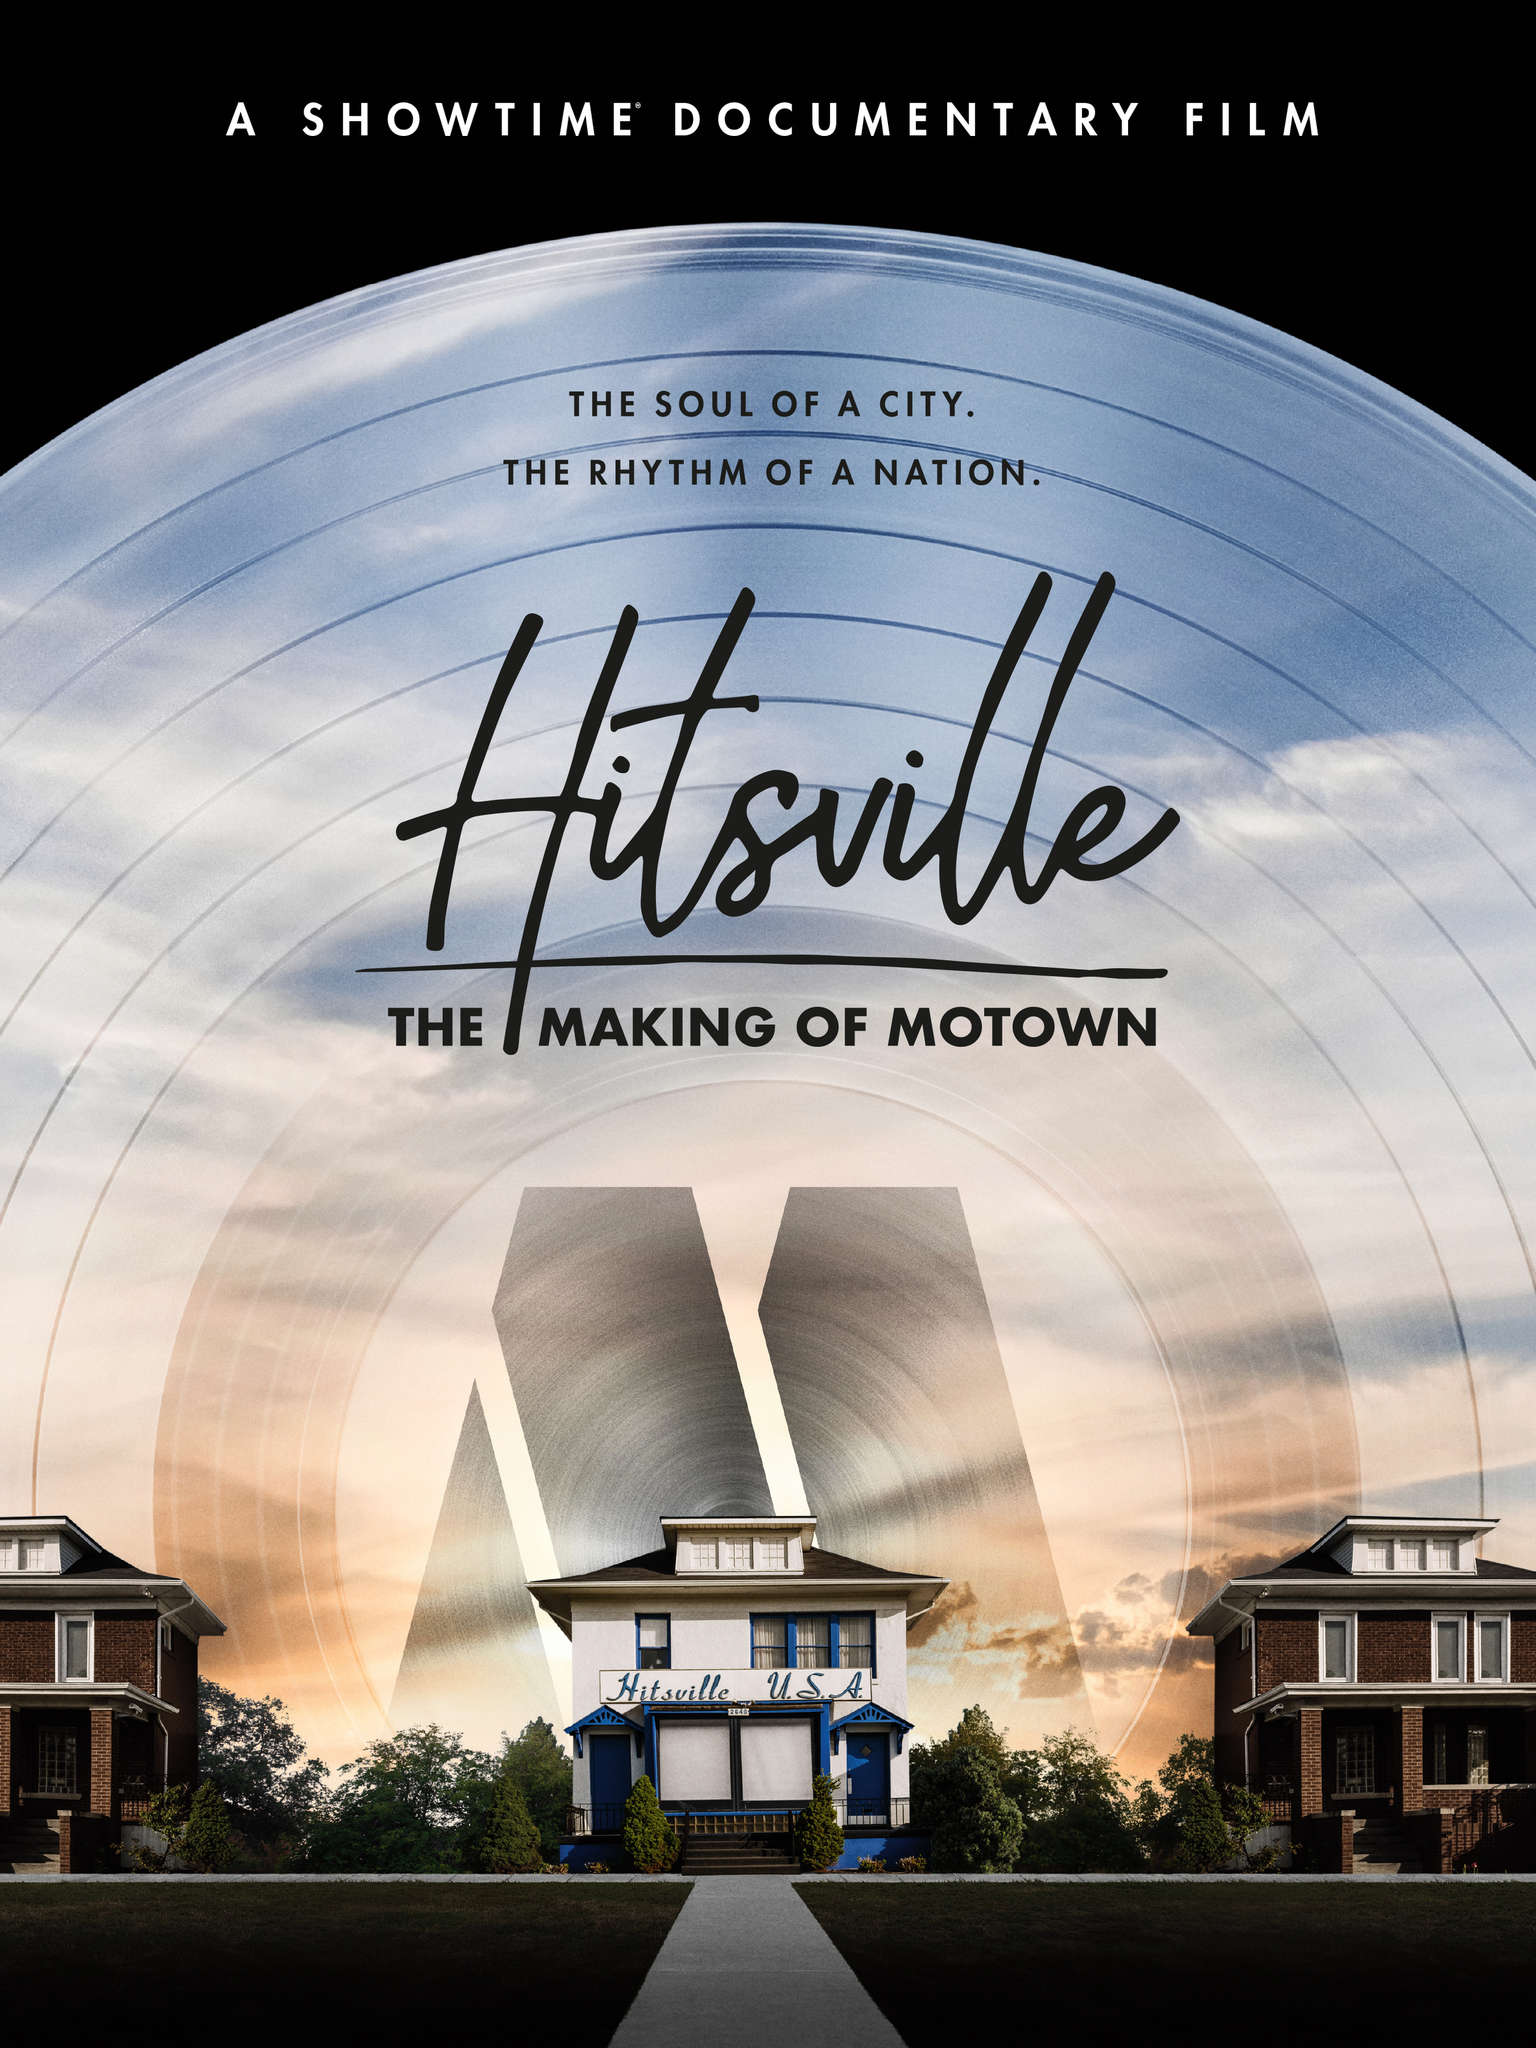 Hitsville – the making of motown